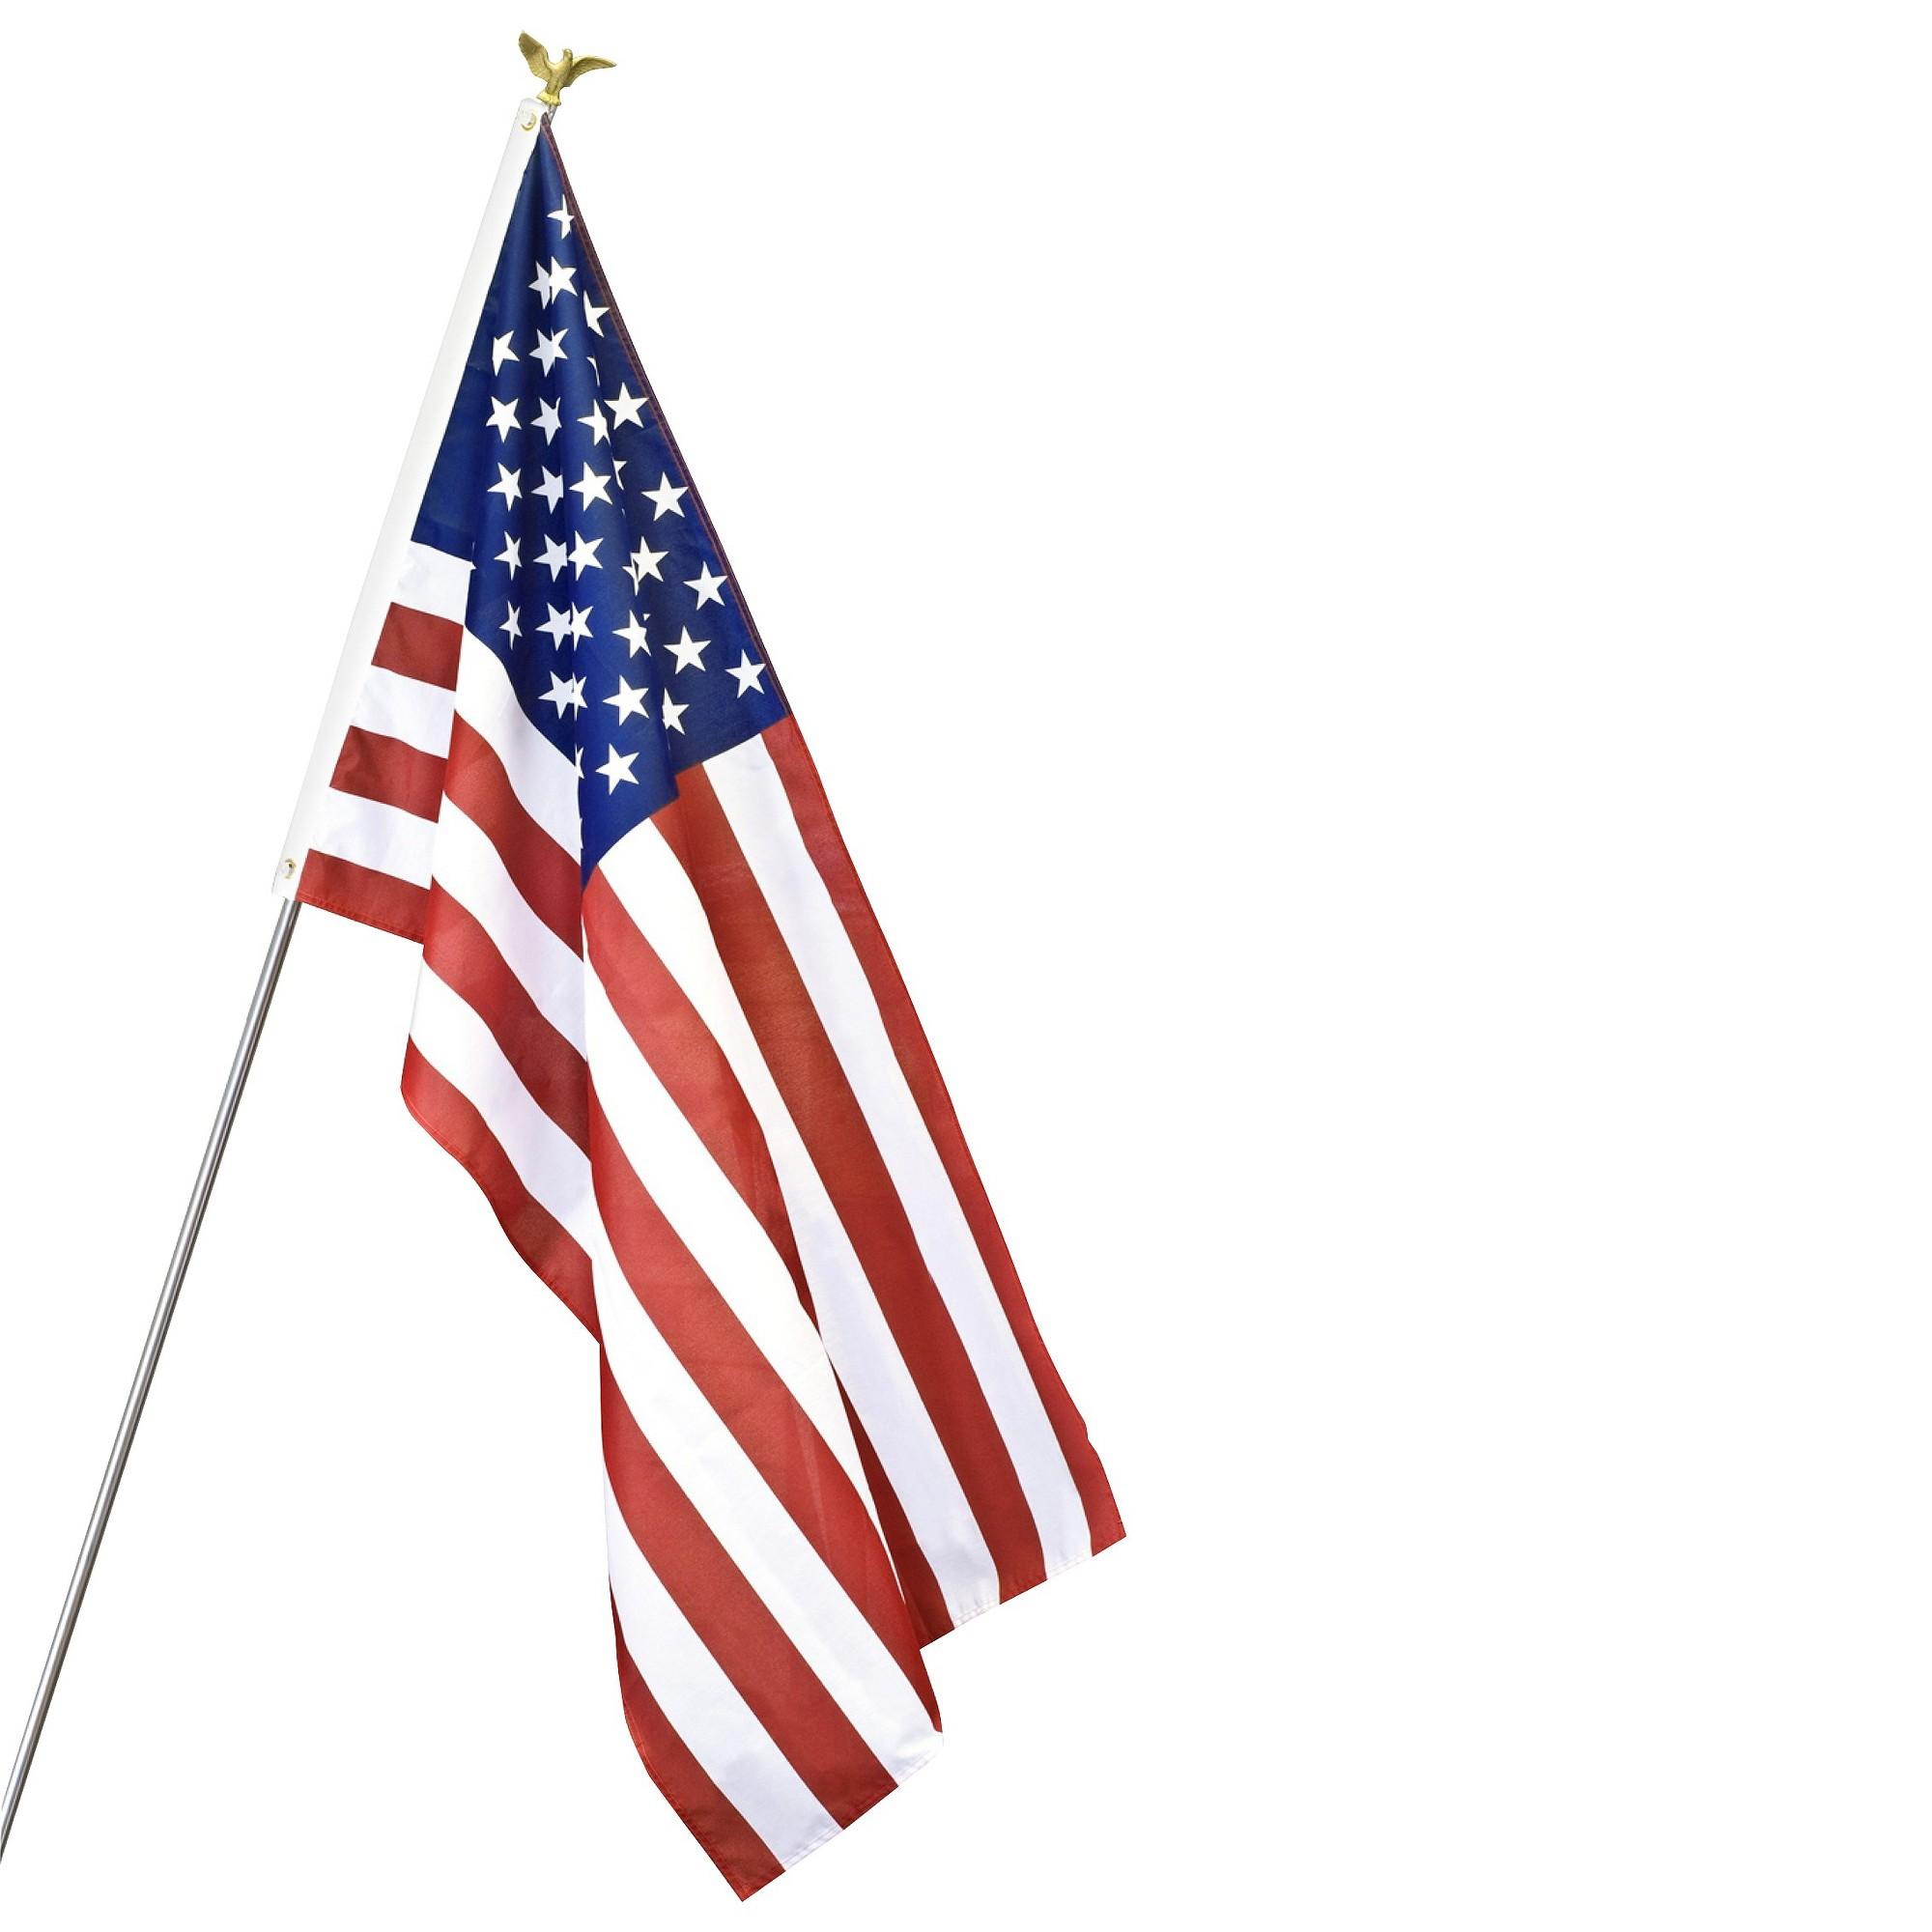 Annin American Flag Set 3 X 5 In 2020 American Flag Drawing American Flag Flag Drawing